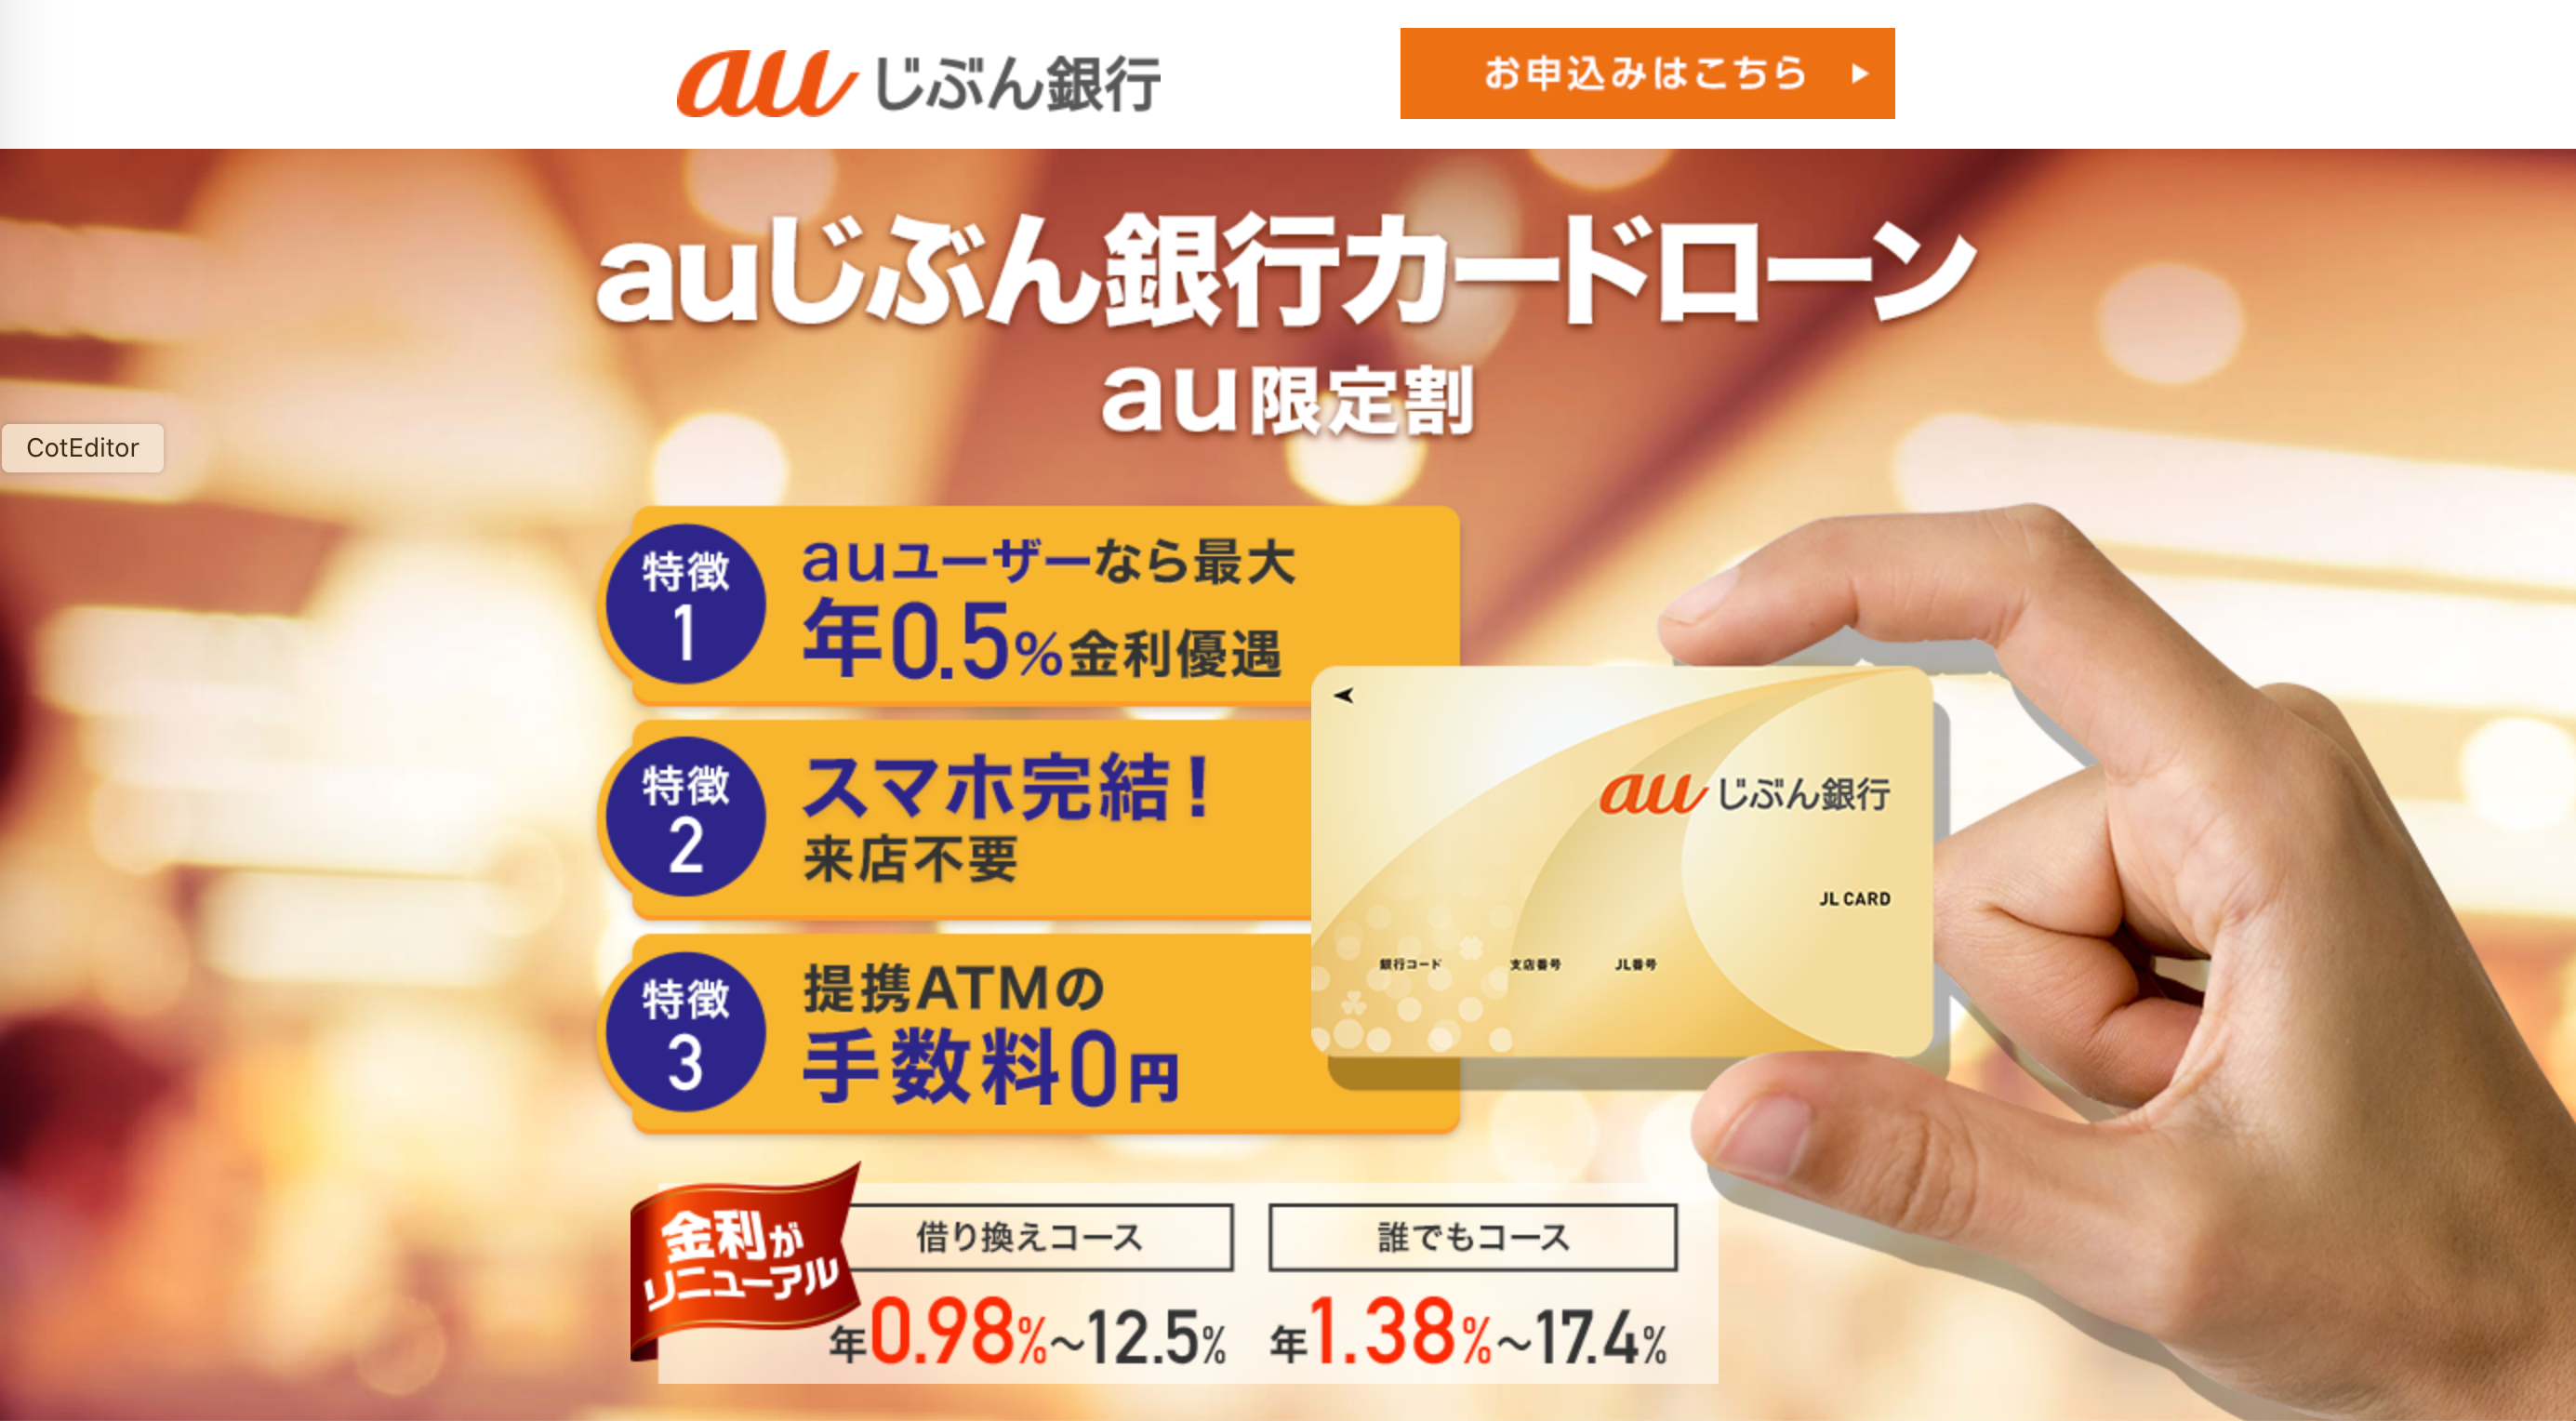 auじぶん銀行カードローンau限定割 借り換えコース